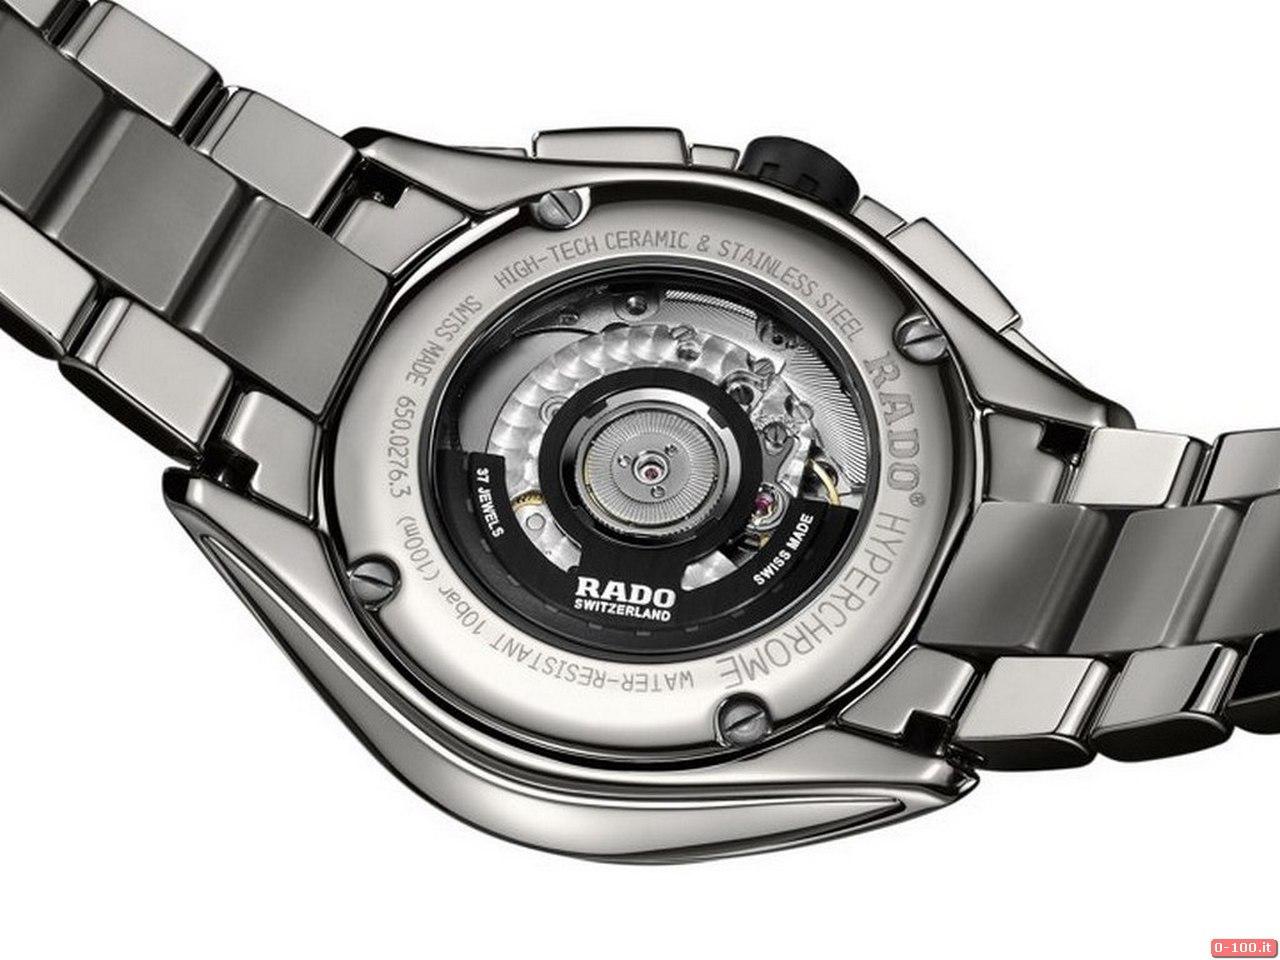 anteprima-baselworld-2014-rado-hyperchrome-automatic-chronograph-plasma-ceramic-prezzo-price_0-1004